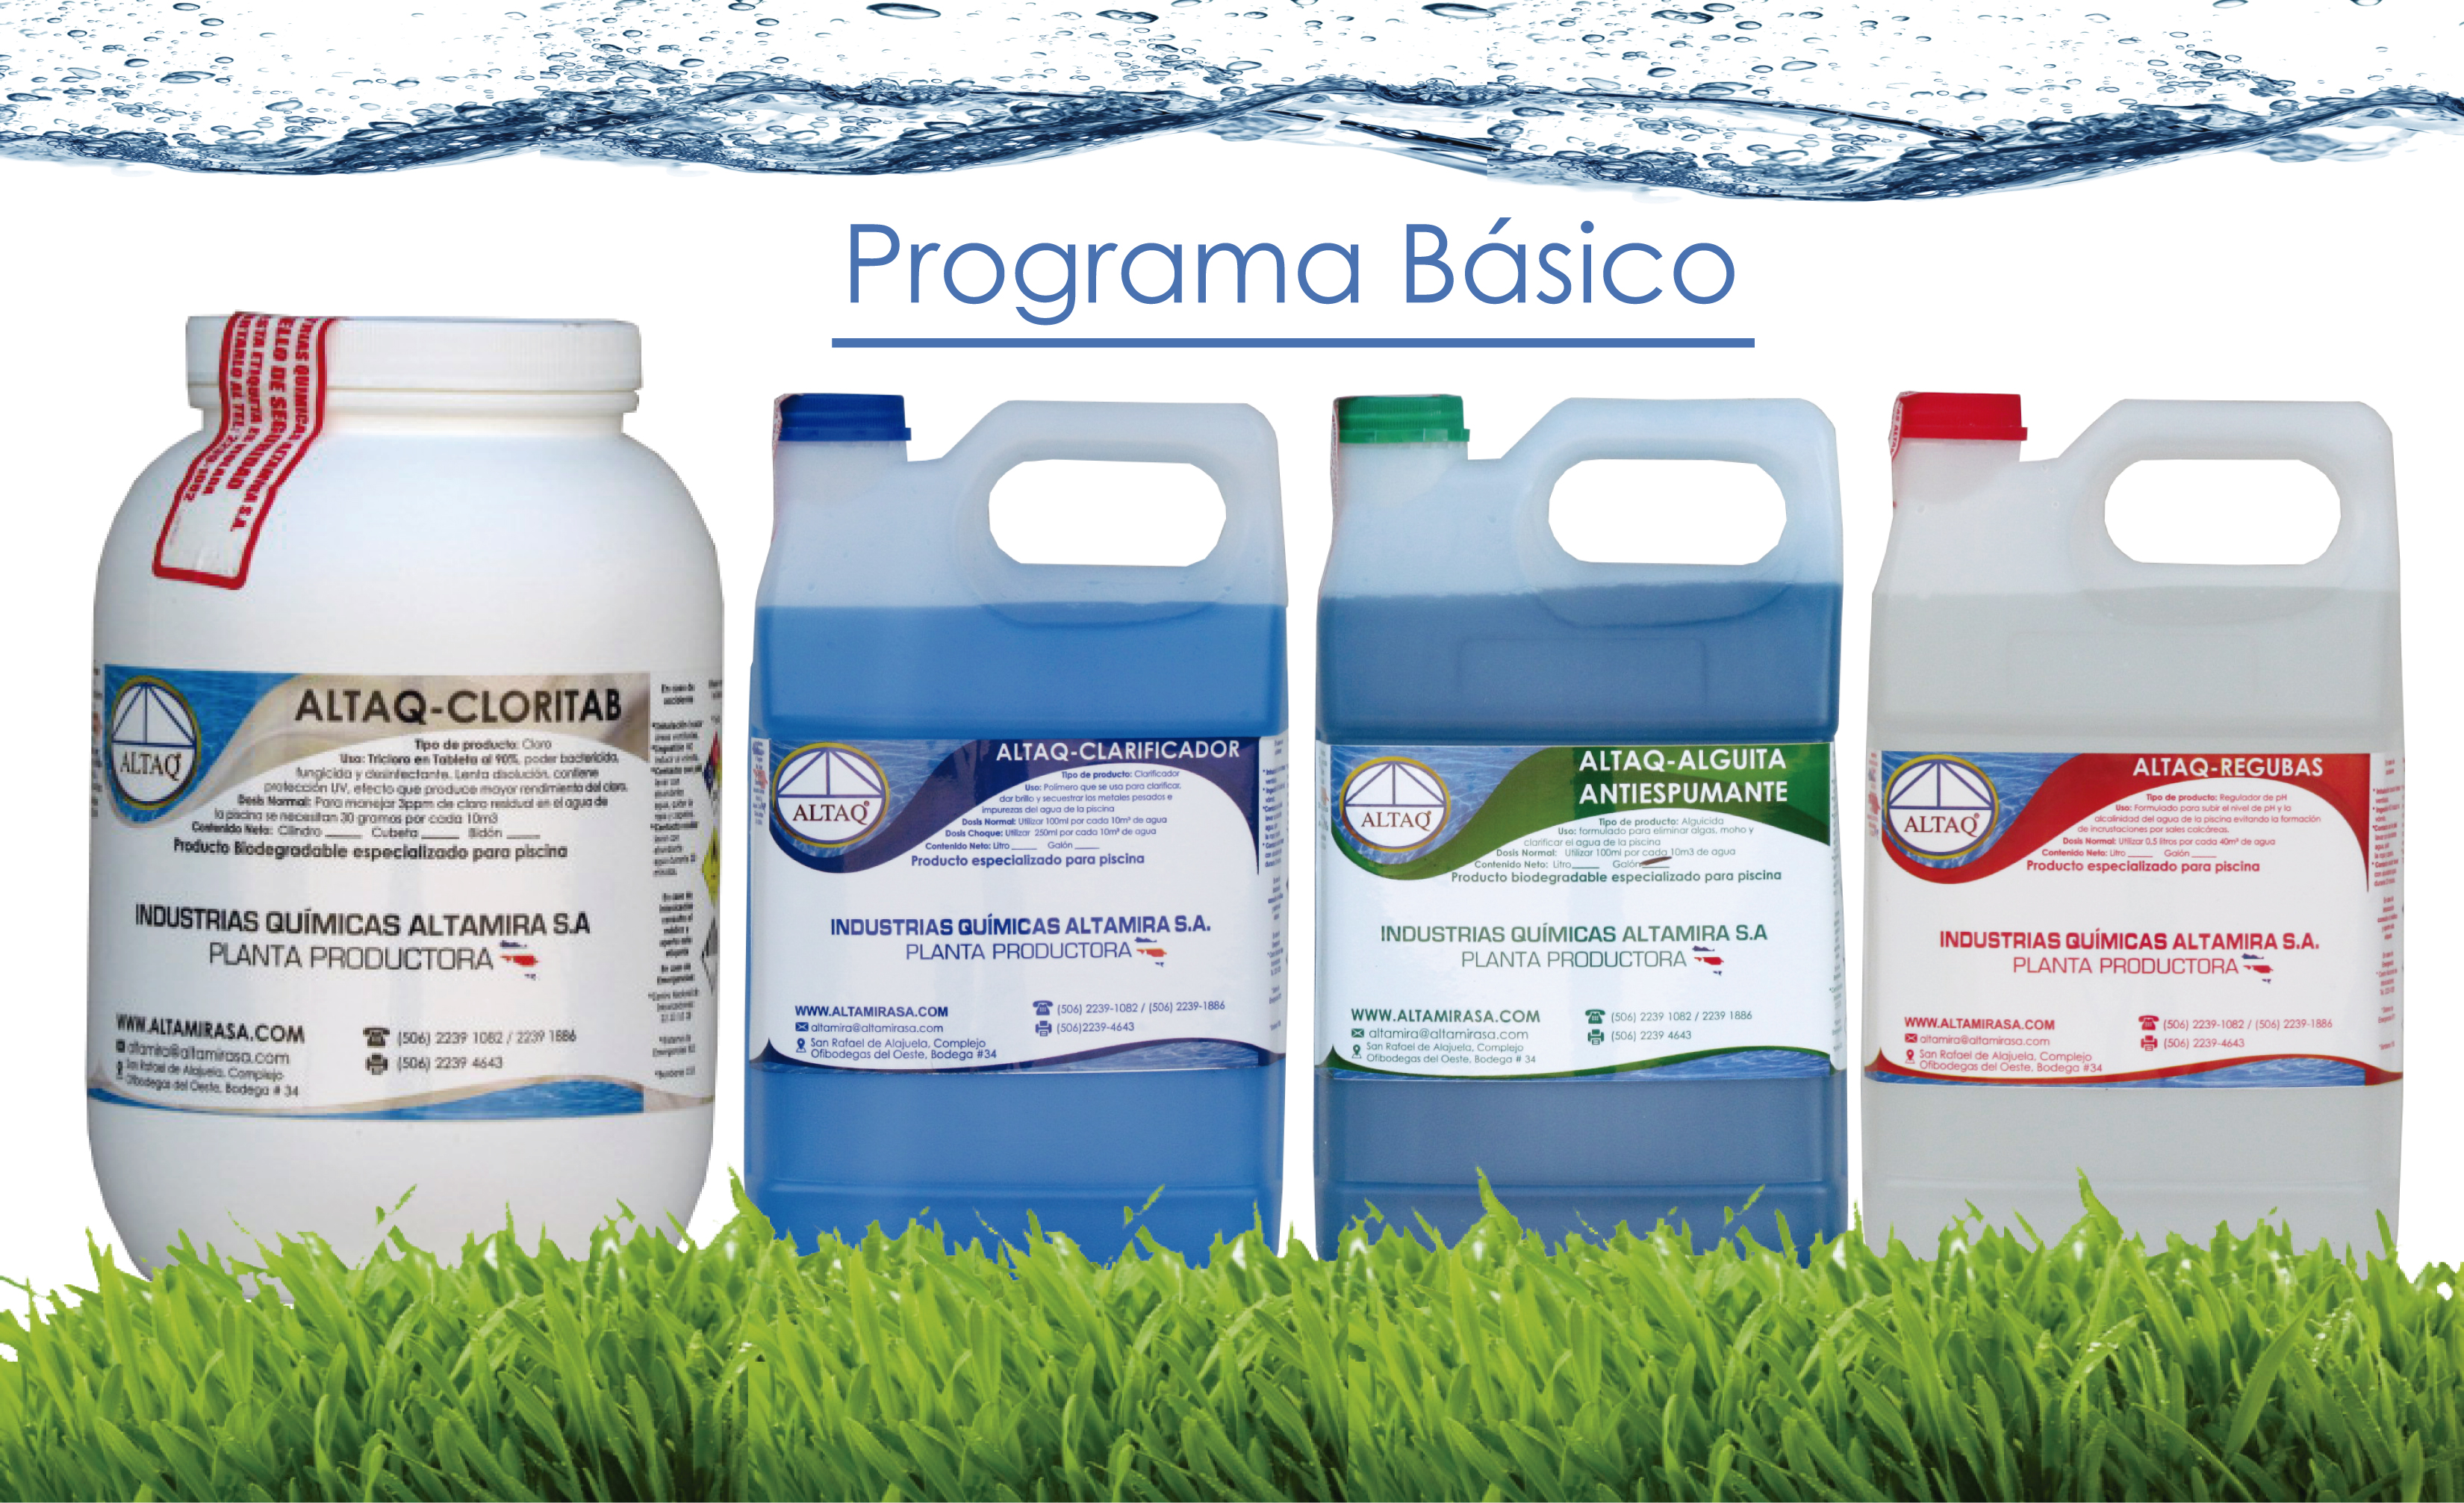 Productos para piscinas - Capacitación ALTAQ